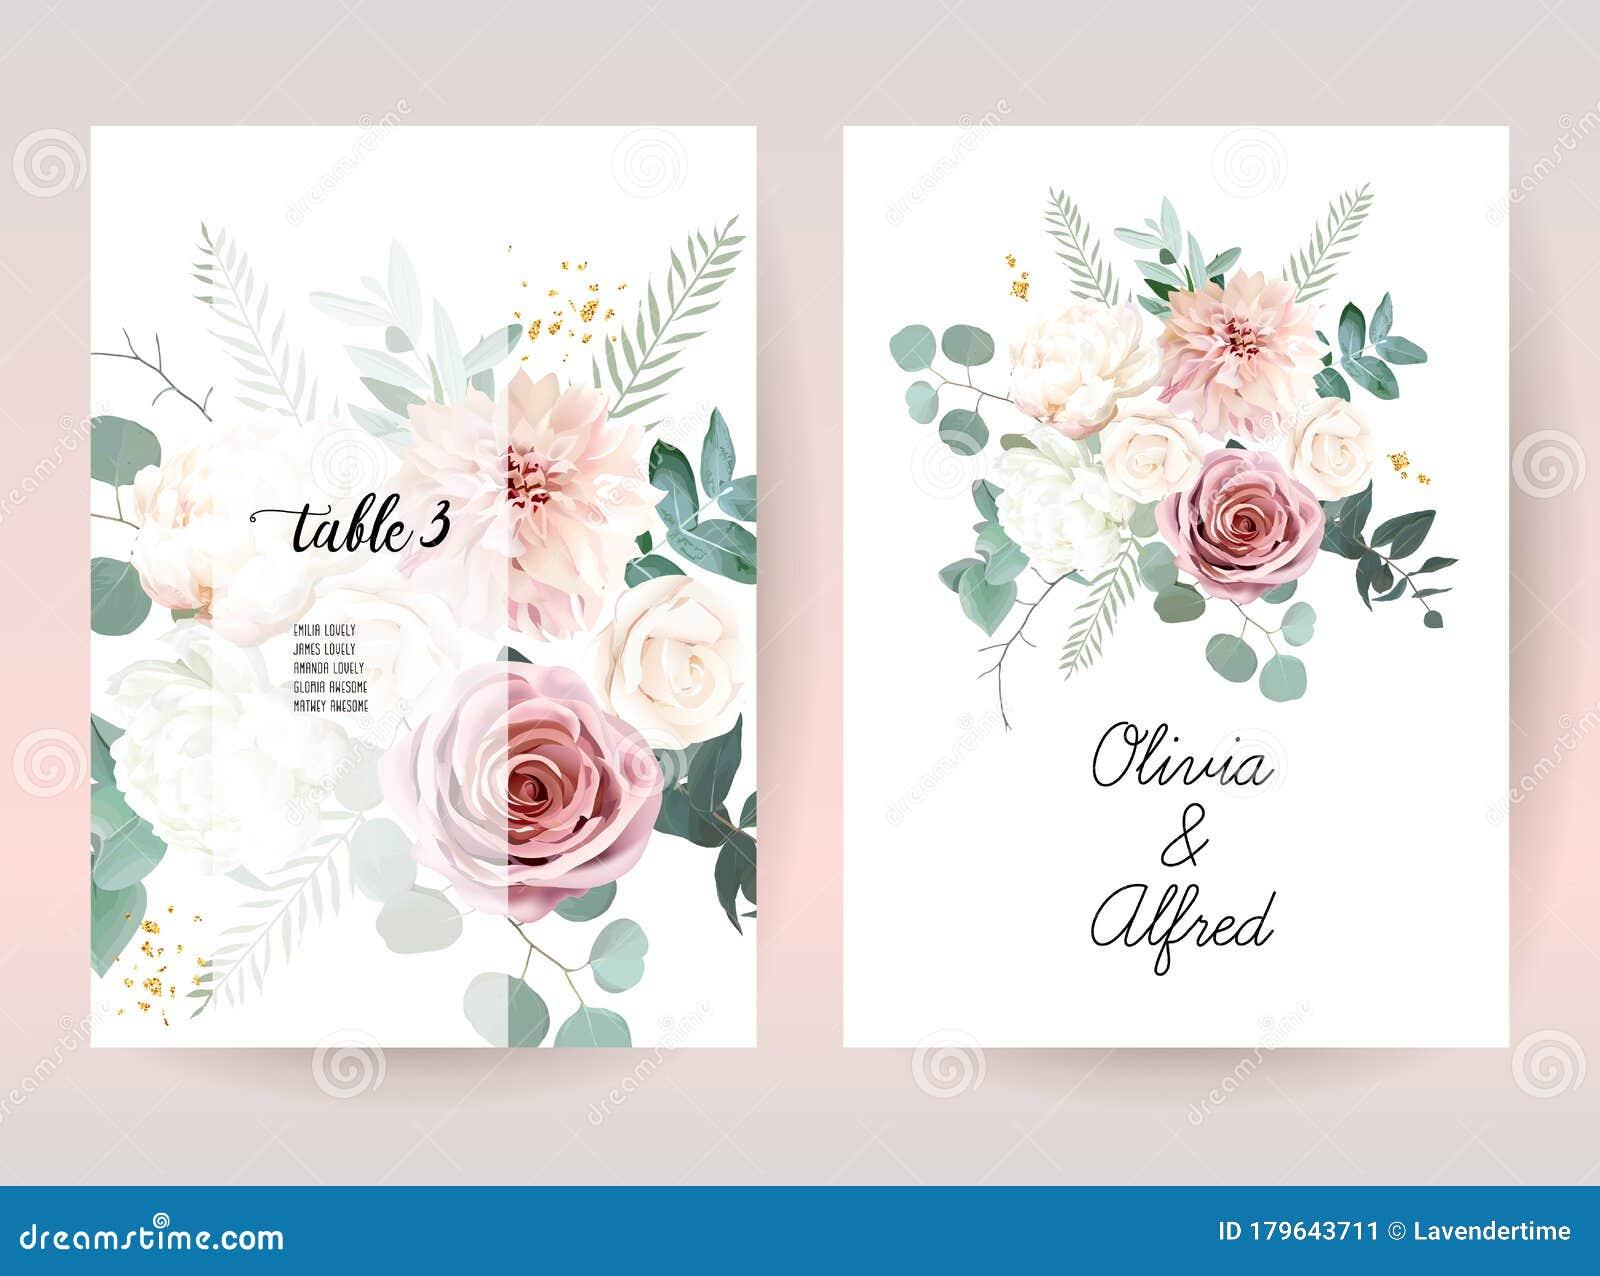 Silver Sage Green And Blush Pink Flowers Vector Design Frames Stock Vector Illustration Of Invitation Blush 179643711